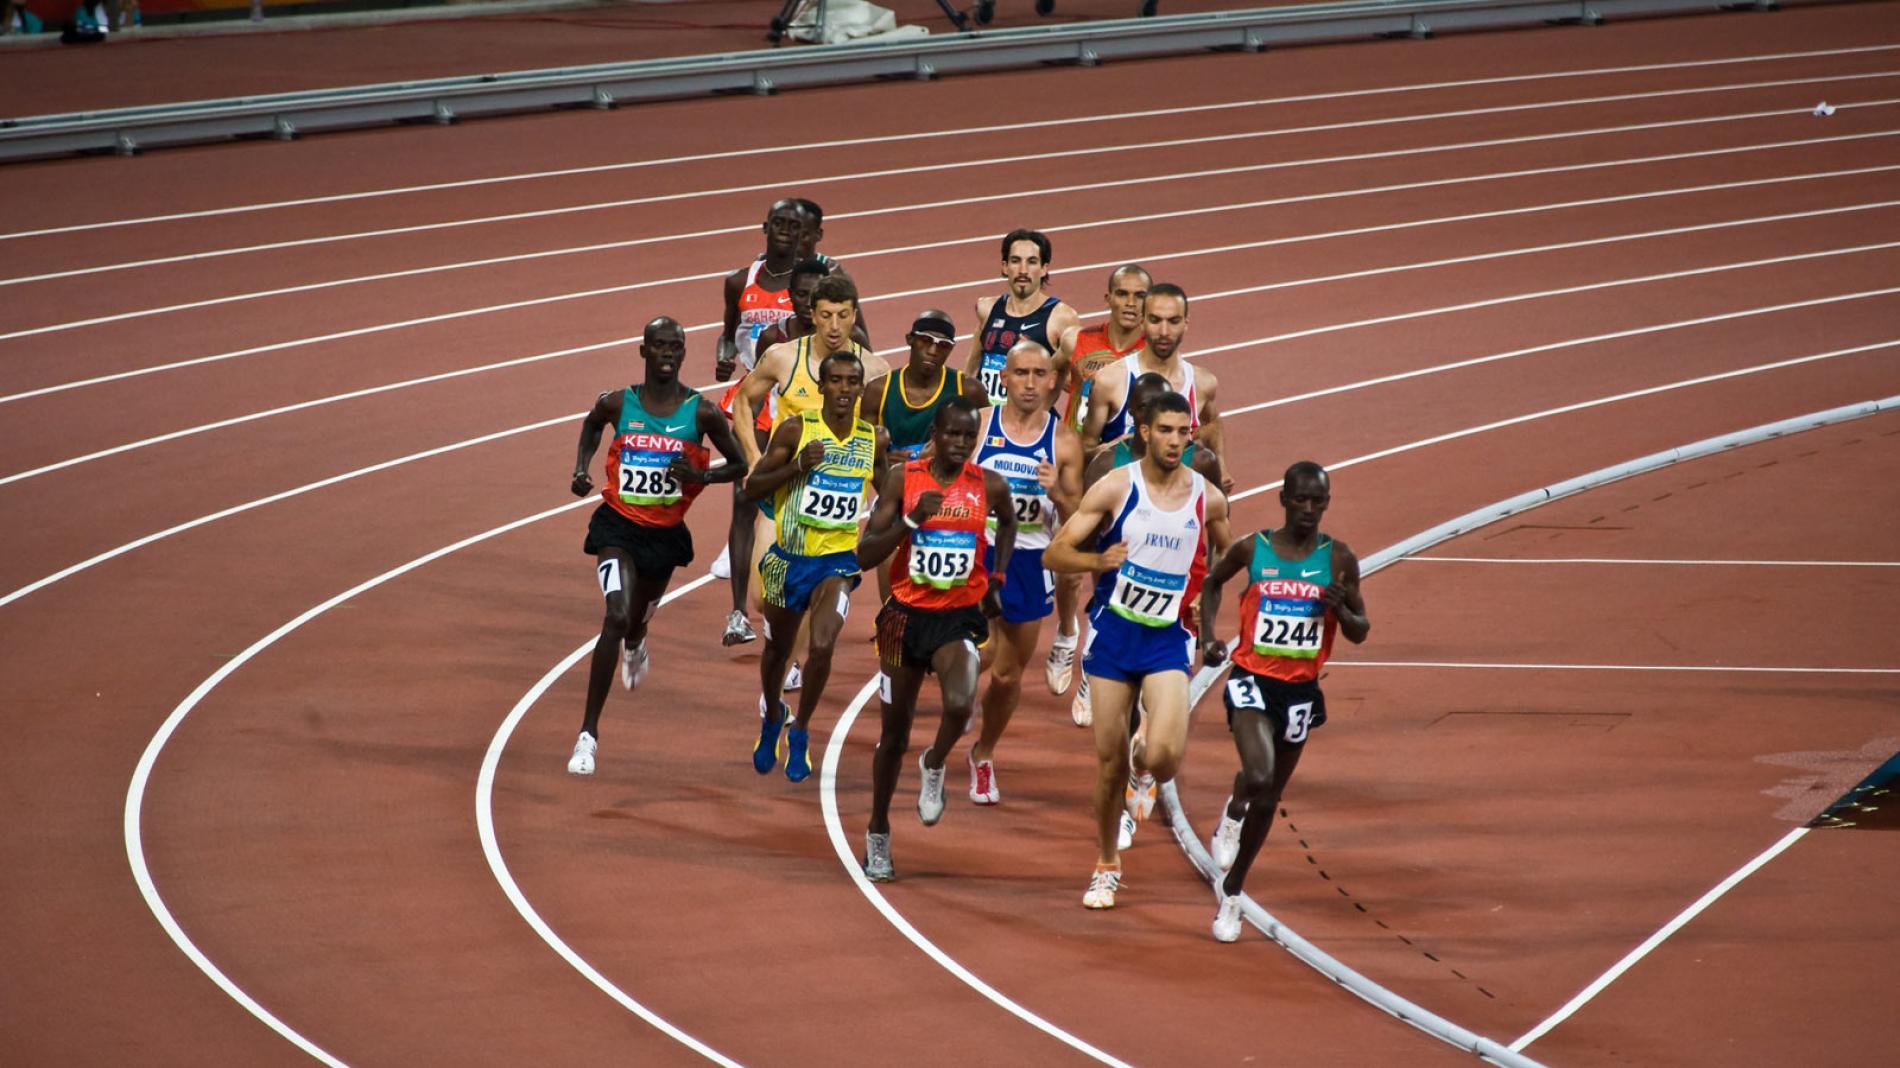 olympicrunning